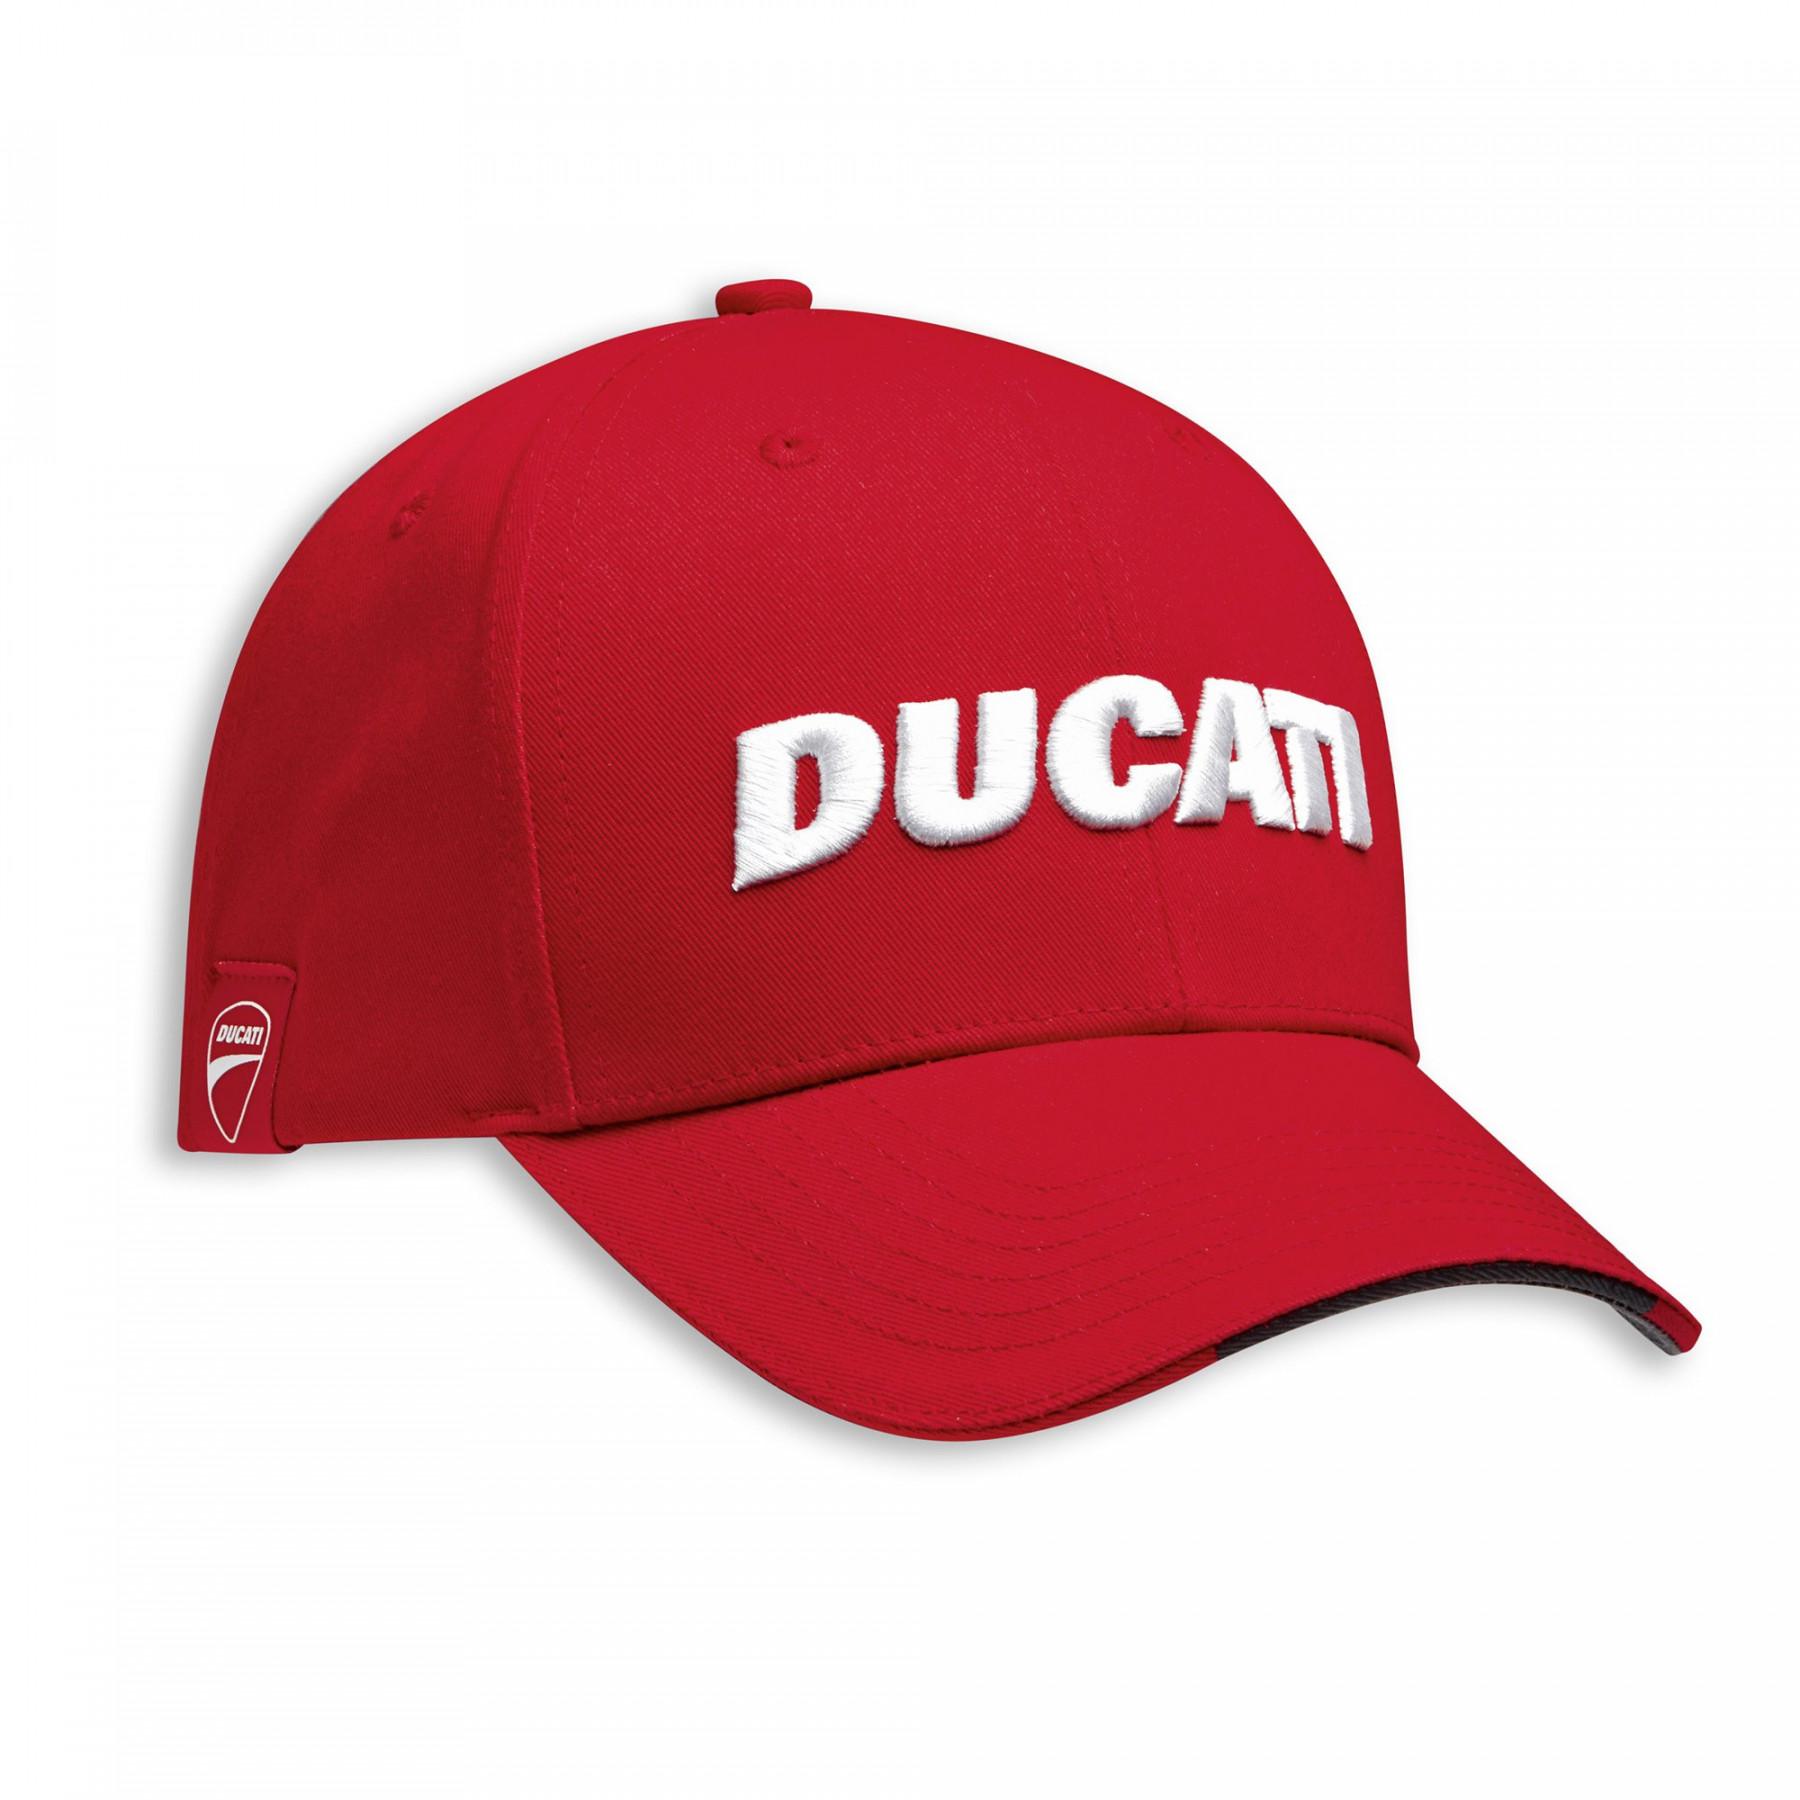 Cap Company 2.0 red